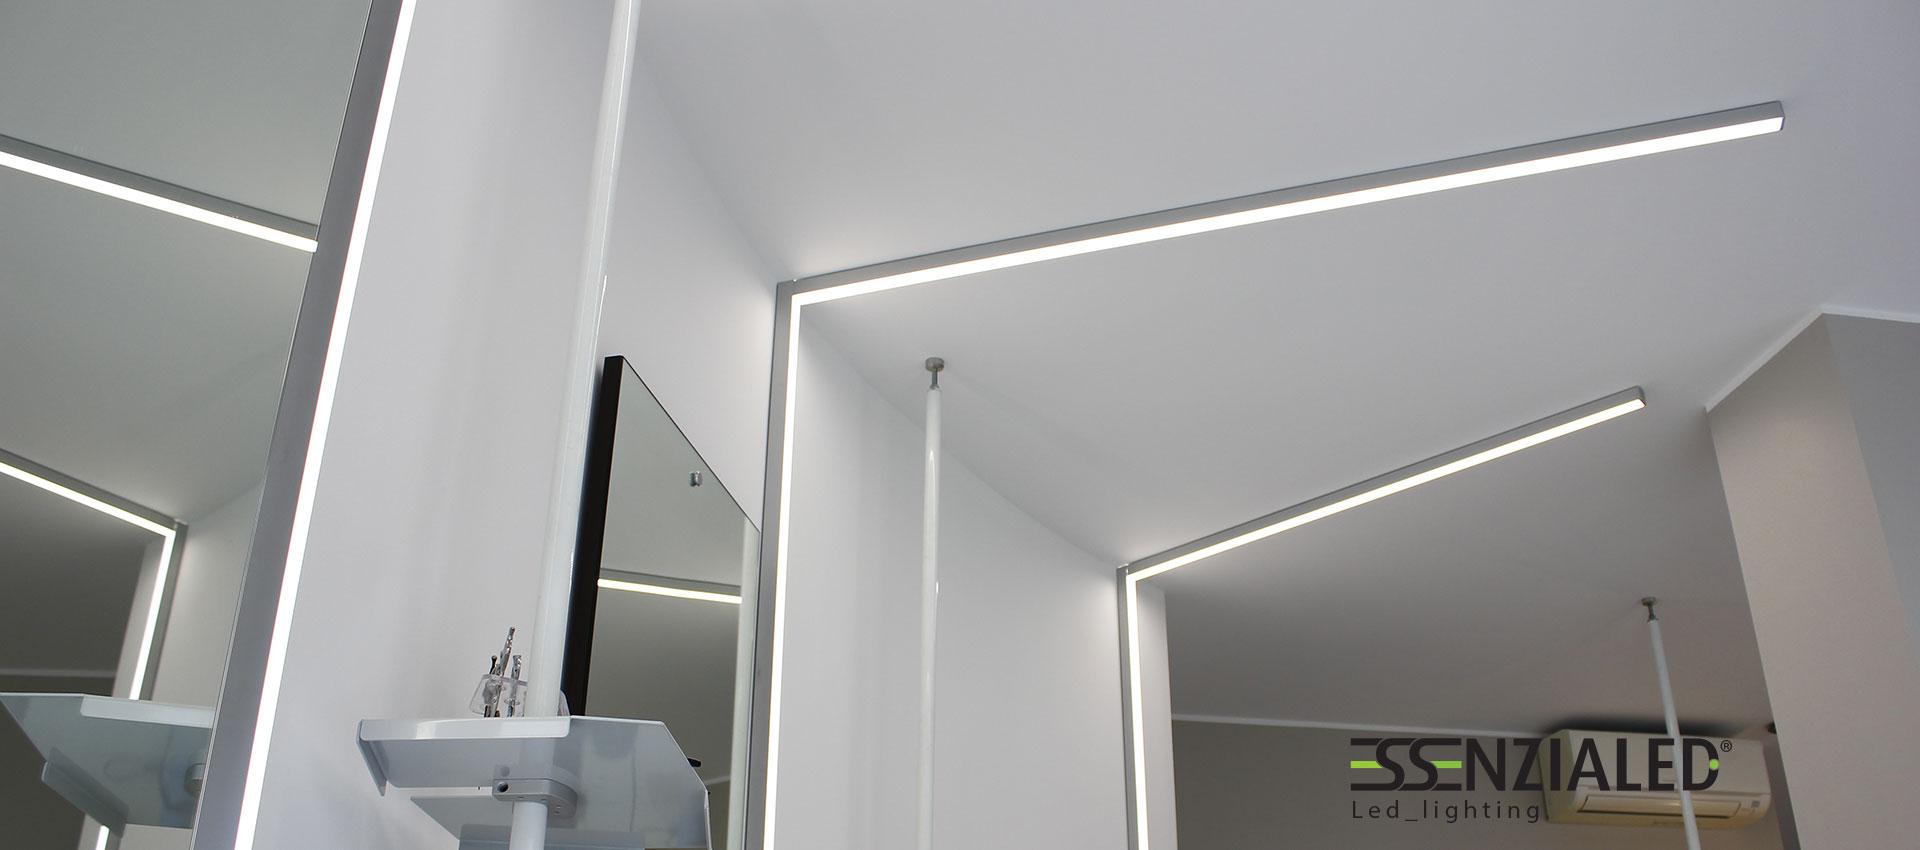 Illuminazione led parrucchieriessenzialed illuminazione - Illuminazione led interni casa ...